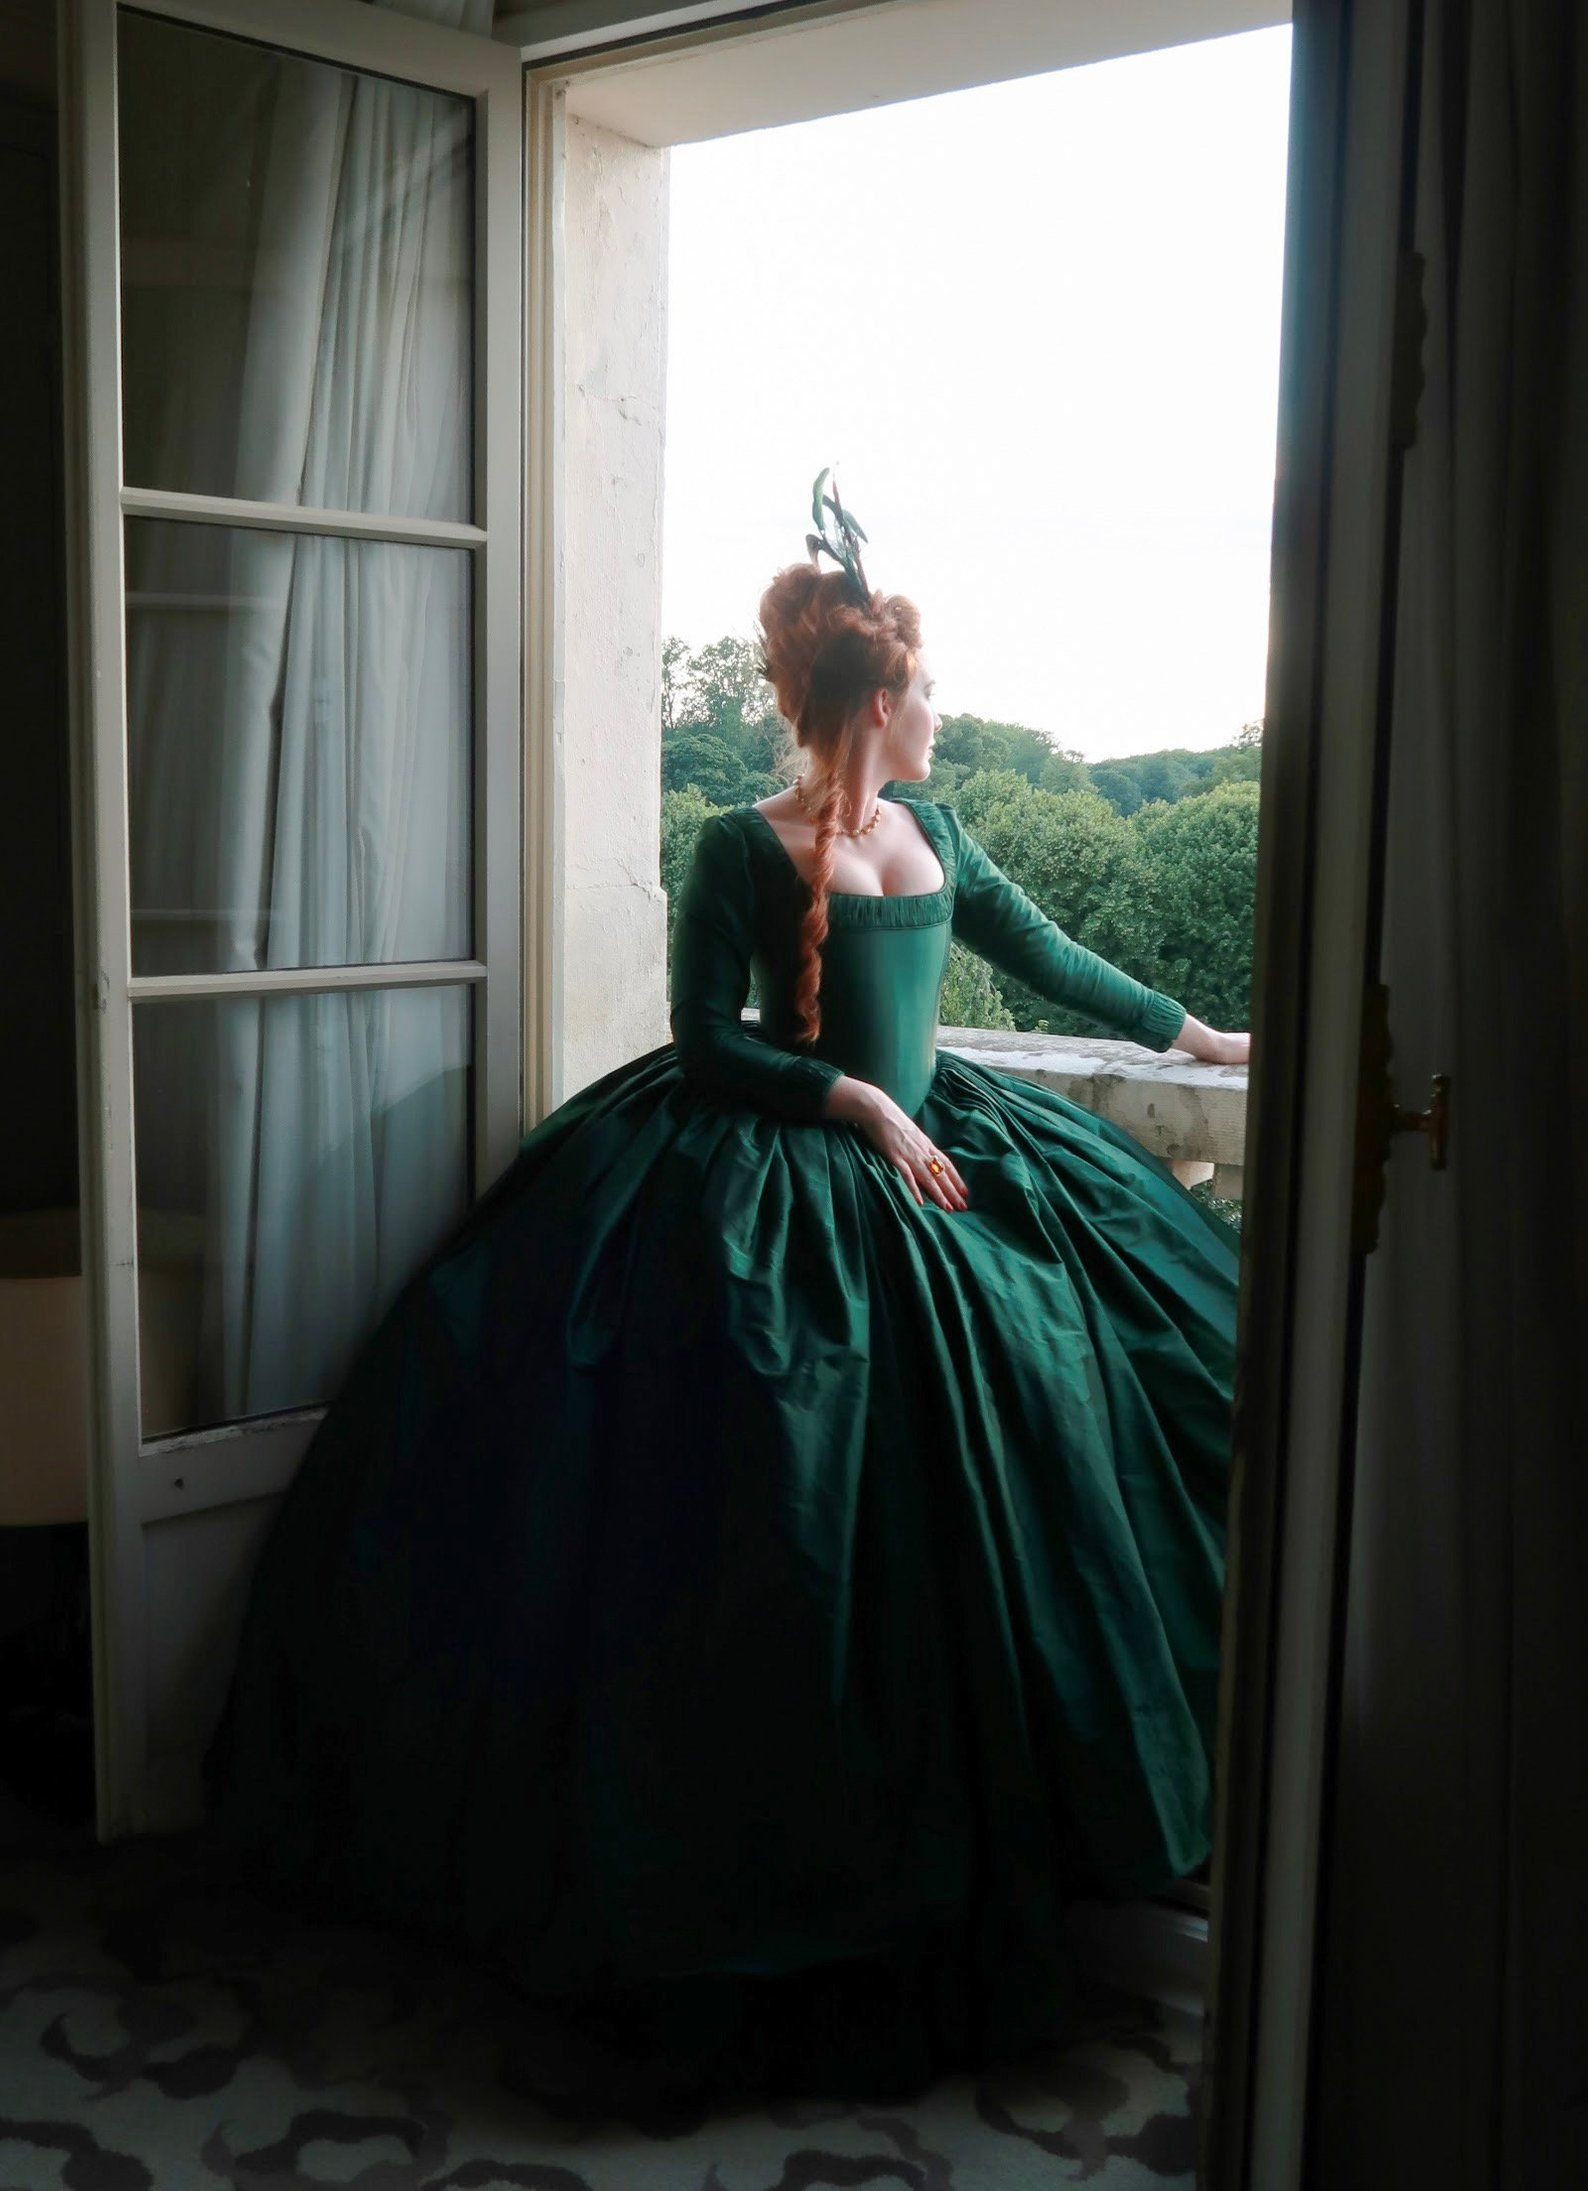 Maria Antonietta Rococo Baroque Victorian Vacation Dress Dress Party Costume Prom Dress Women S Satin Costume Dark Green Vintage Cosplay Party Halloween Party Pakaian Abad Pertengahan Gaun Abad Pertengahan Gaya Model [ 1000 x 1000 Pixel ]